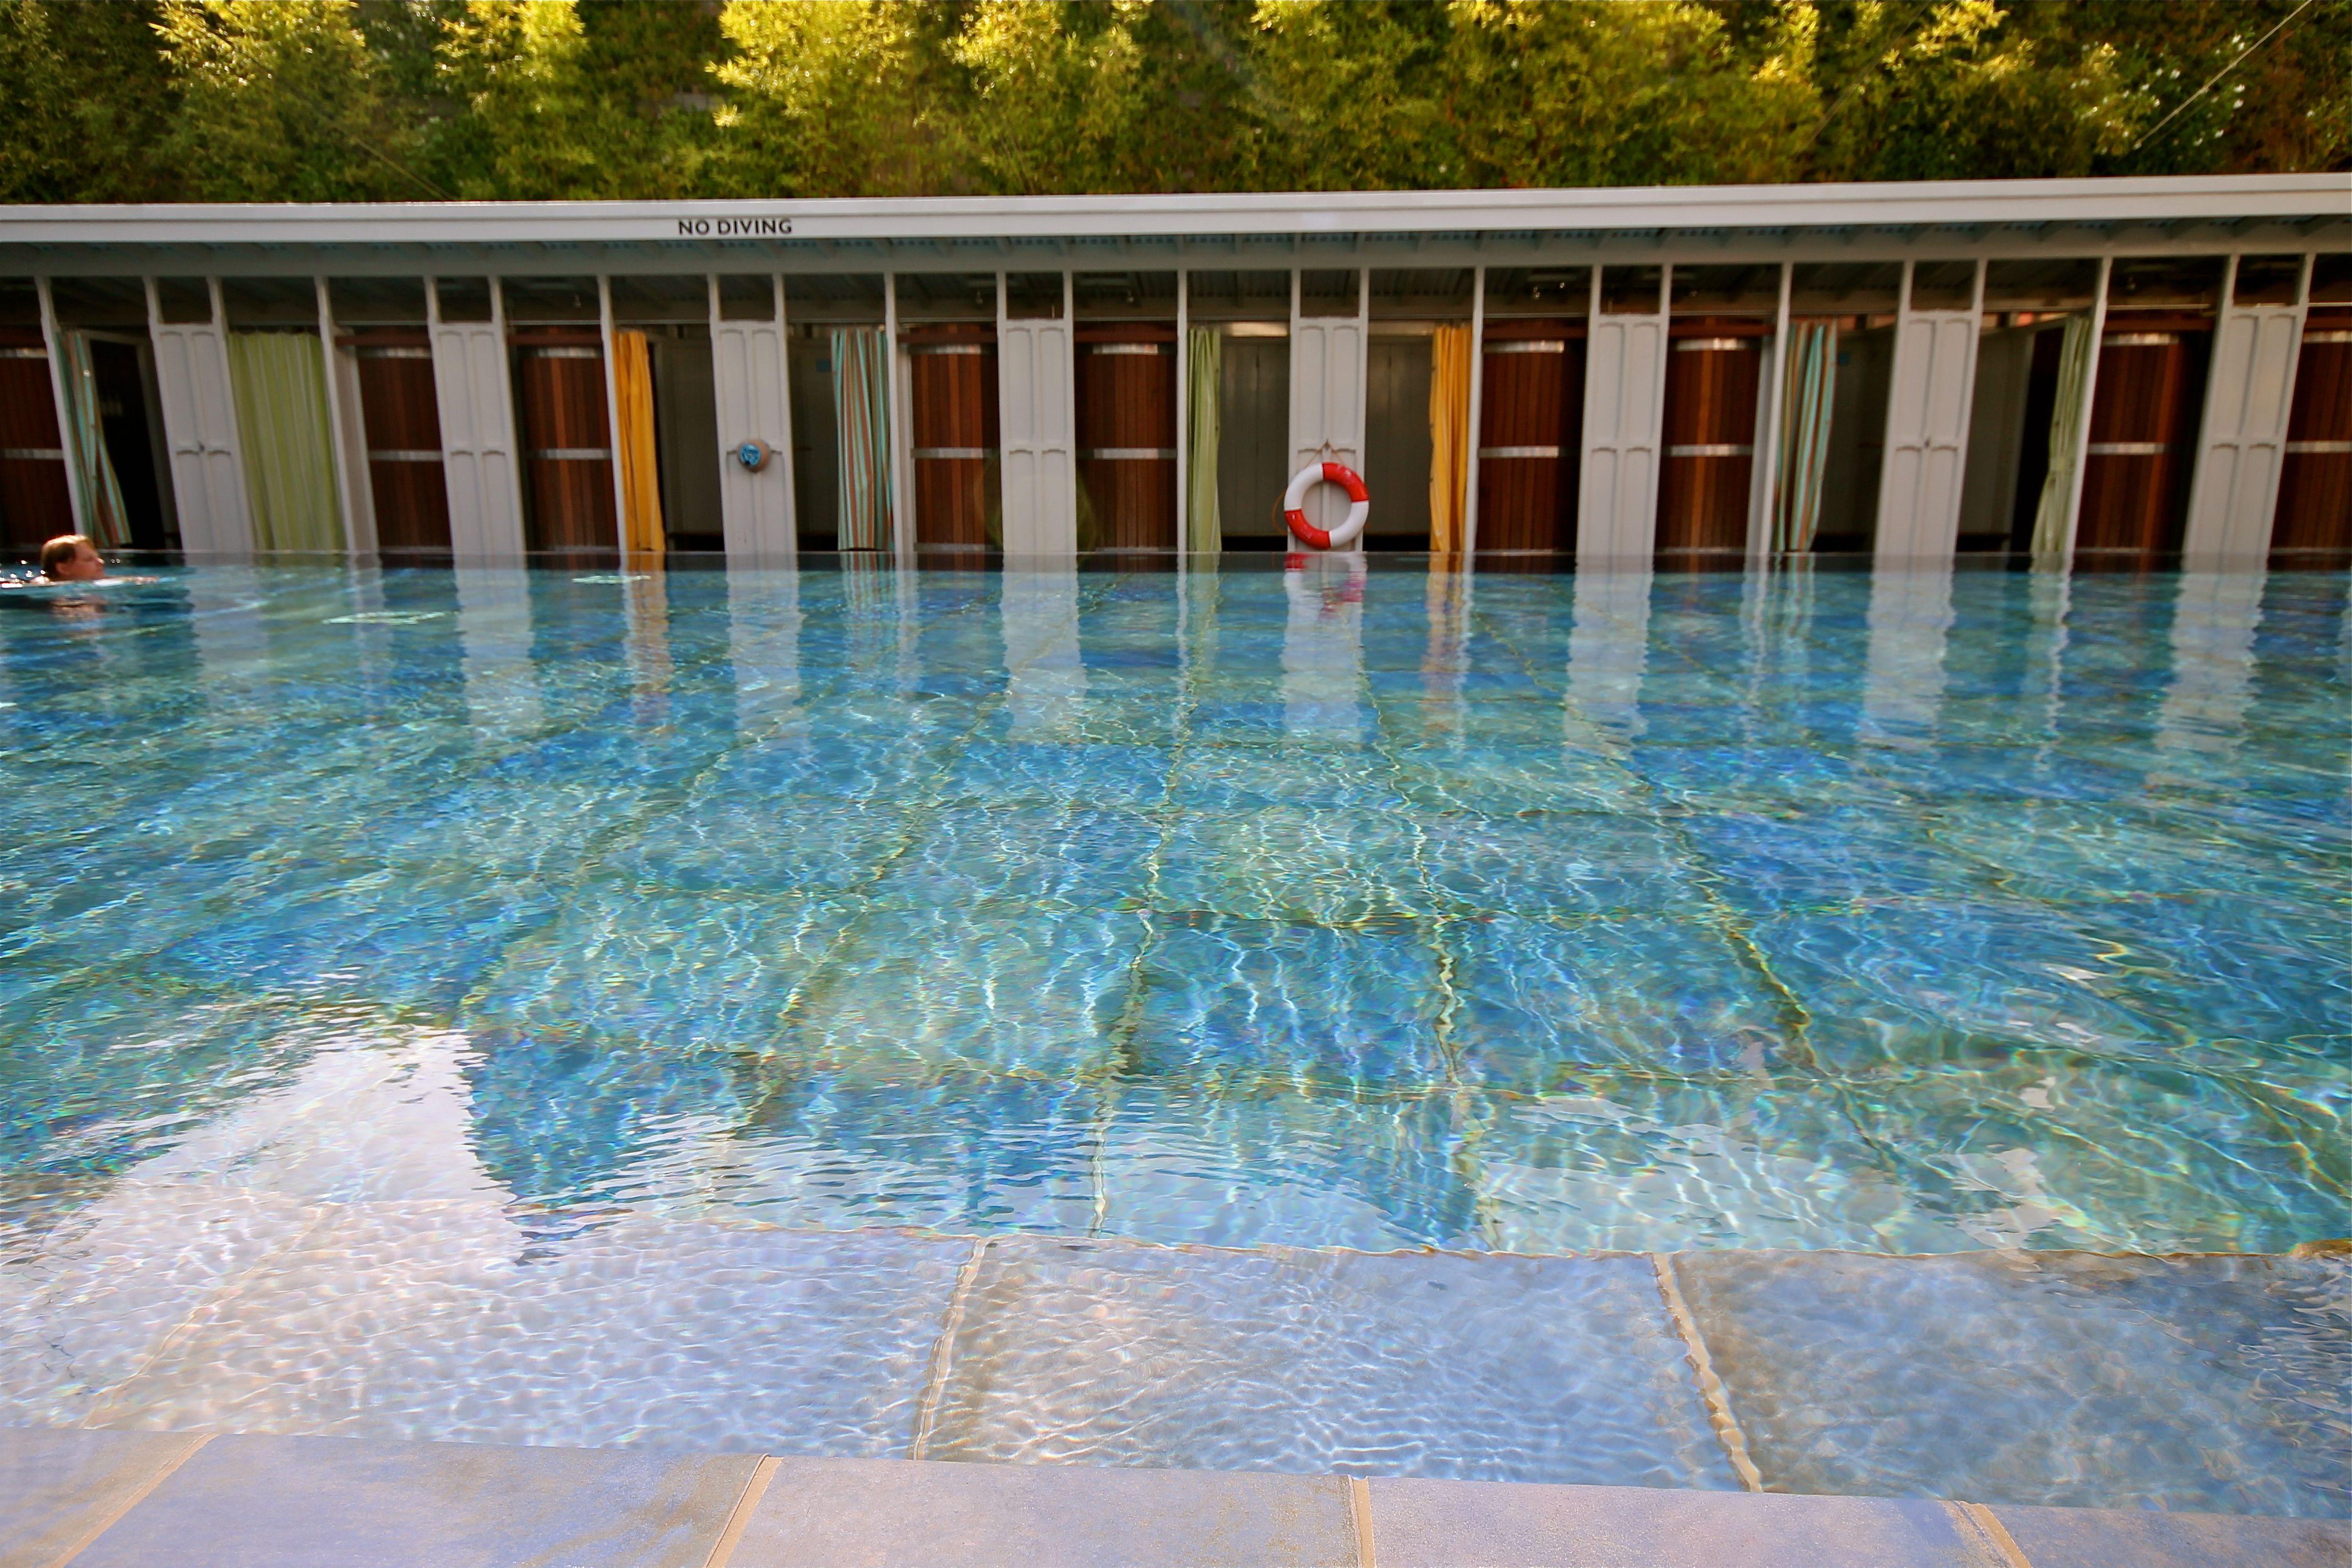 bristol lido pool lido outdoor pool swimming pools. Black Bedroom Furniture Sets. Home Design Ideas